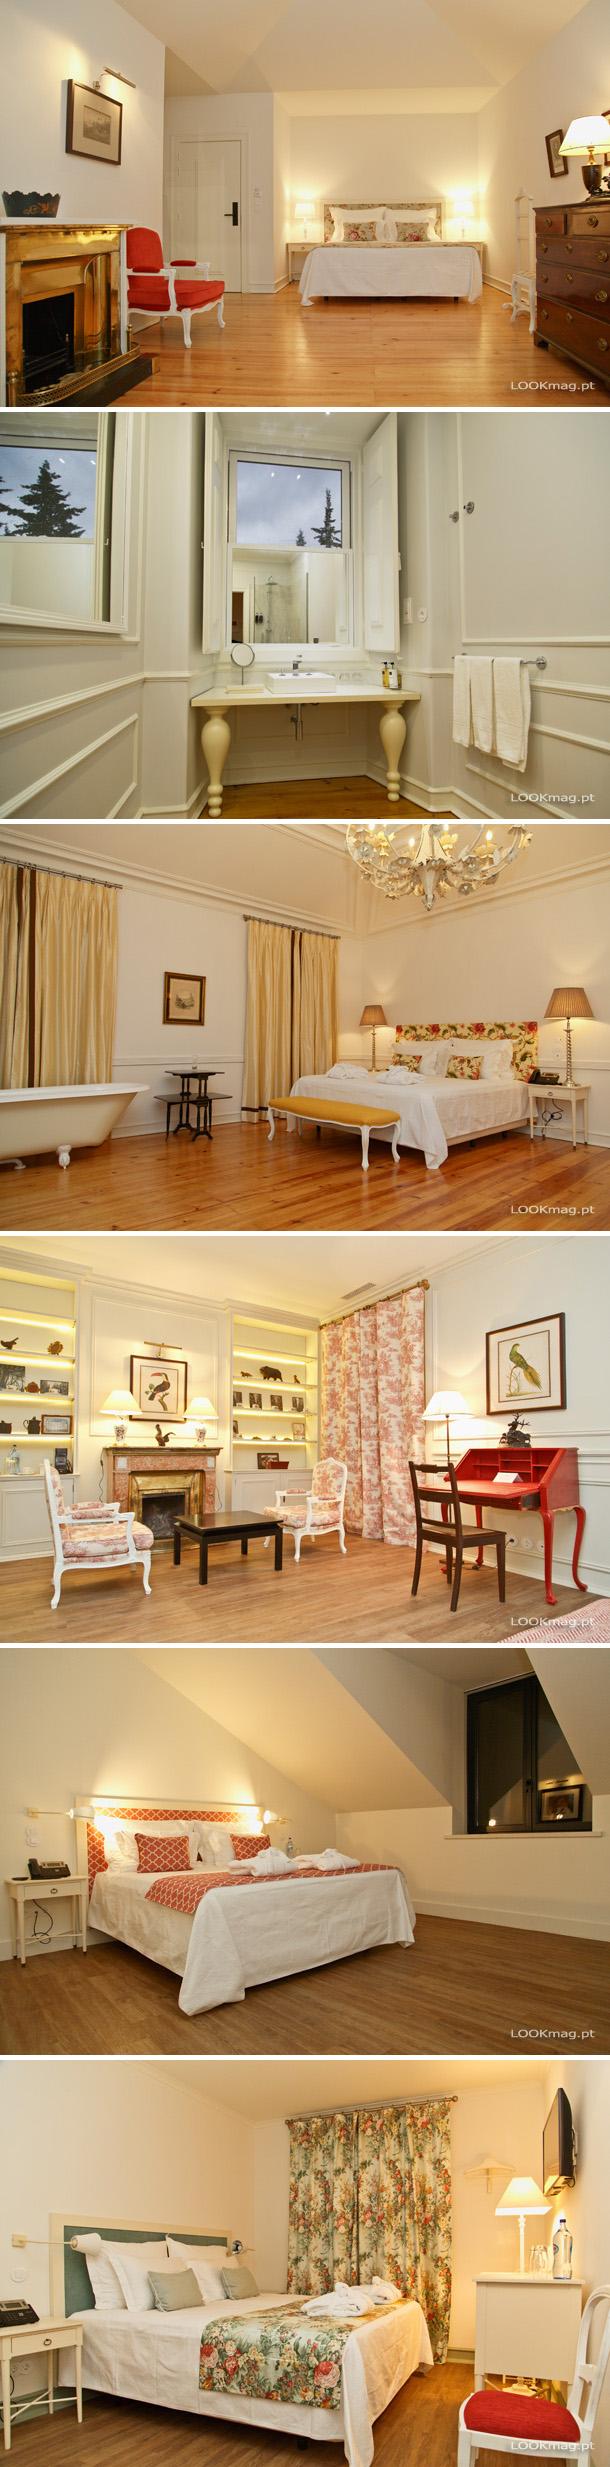 hotel_casa_palmela-lookmag_pt-13_18